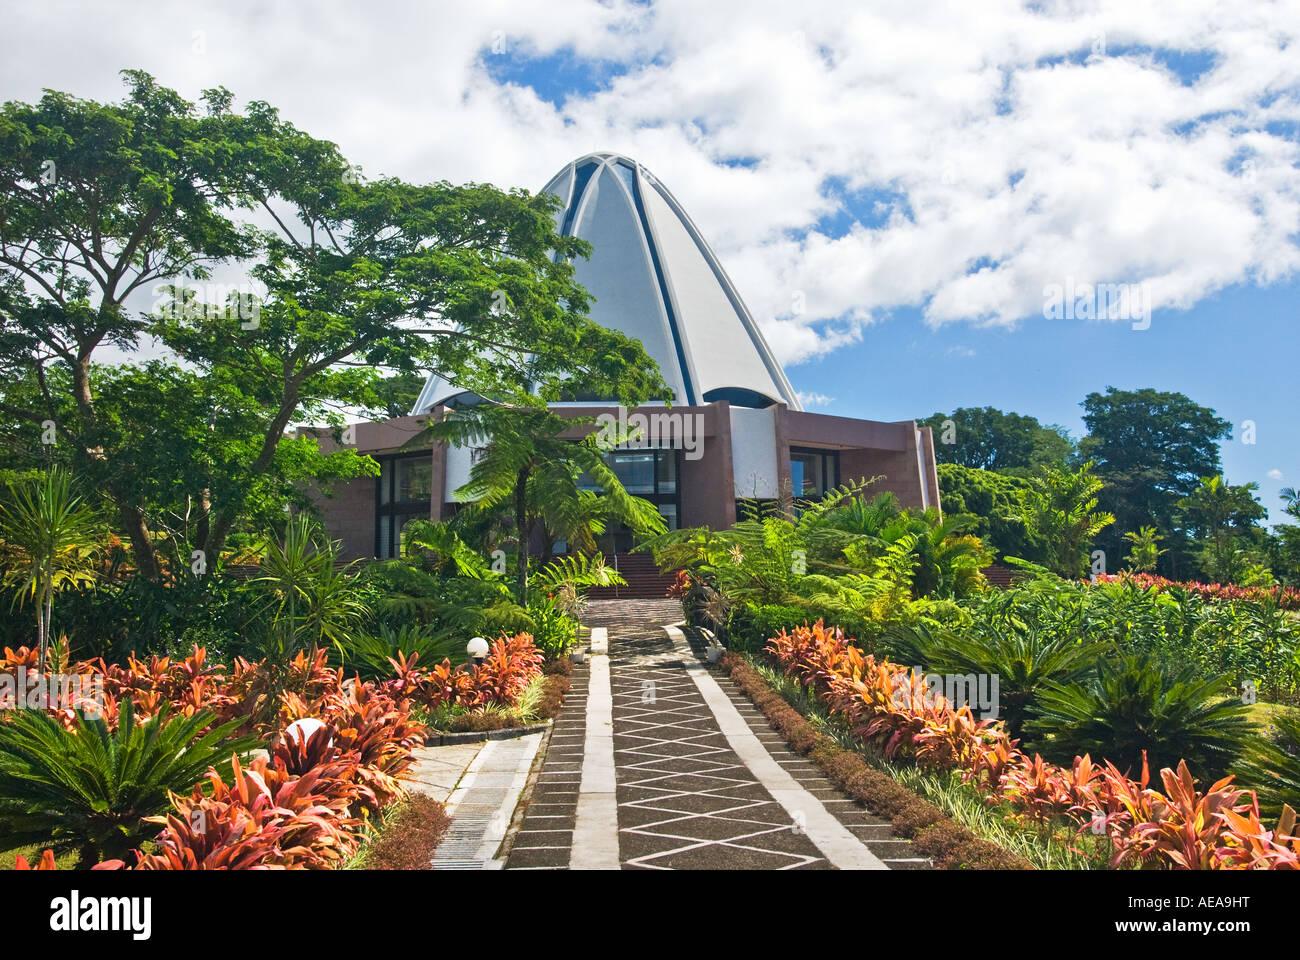 Garden of the baha 39 i house of worship in western samoa Sun garden manufactured home community